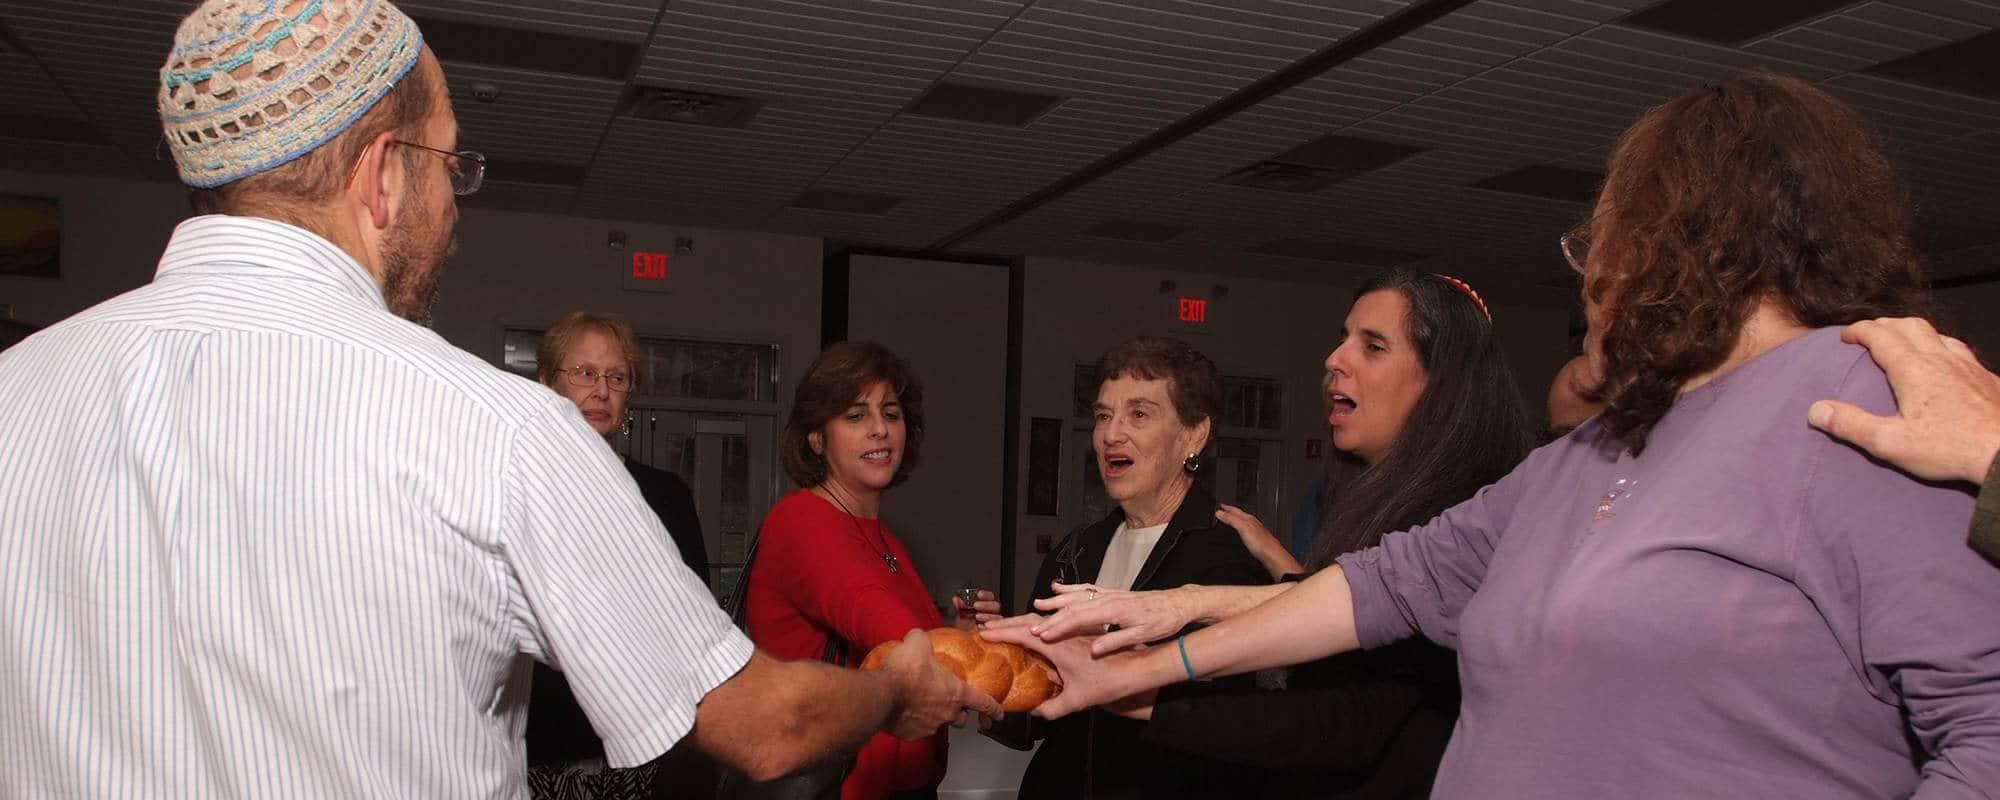 Rabbi Jonathan Kligler Spiritual Leader | rabbijonathankligler.com